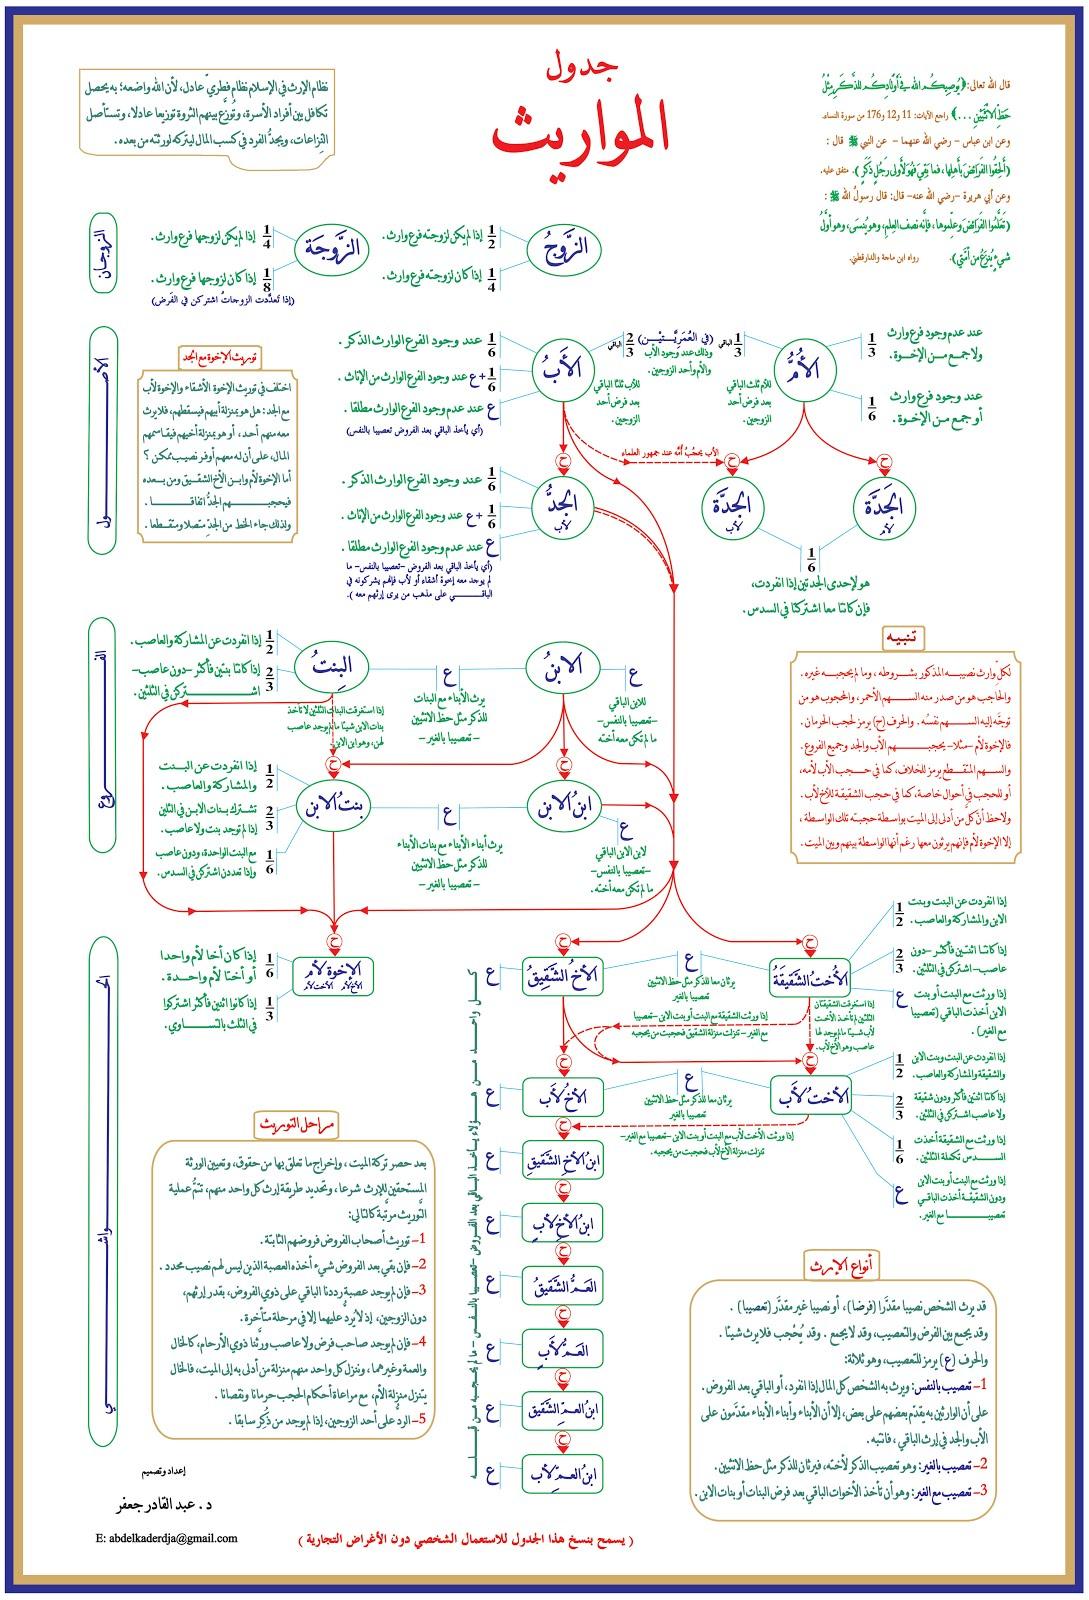 http://adf.ly/2793552/http://www.filedwon.info/ob1vbh4dadik/جداول_المواريث_من_السنتر_التعليمي.jpg.html